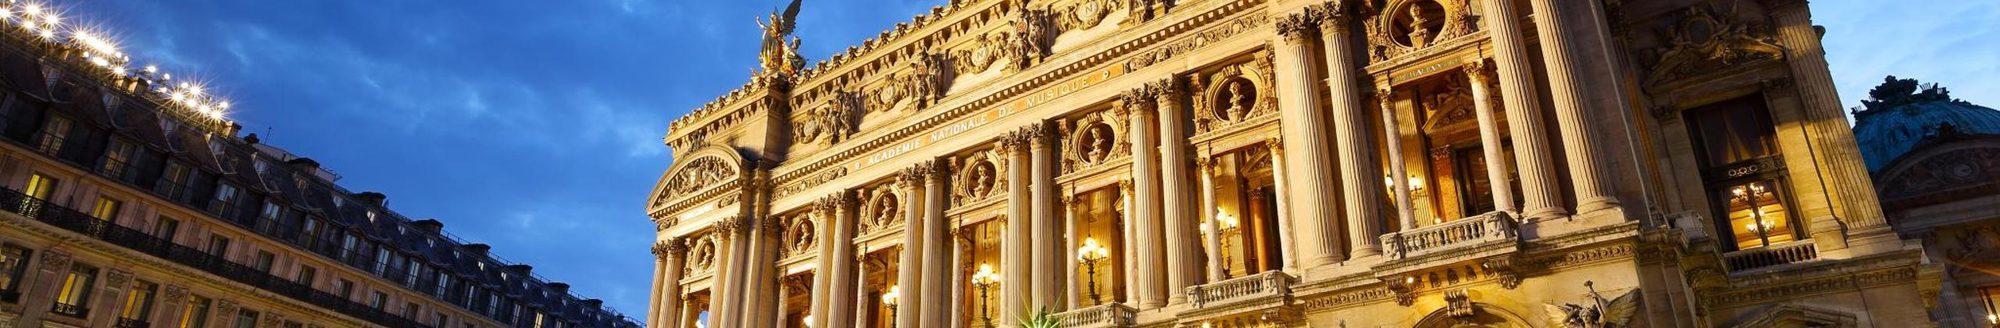 The mysteries of the Palais Garnier